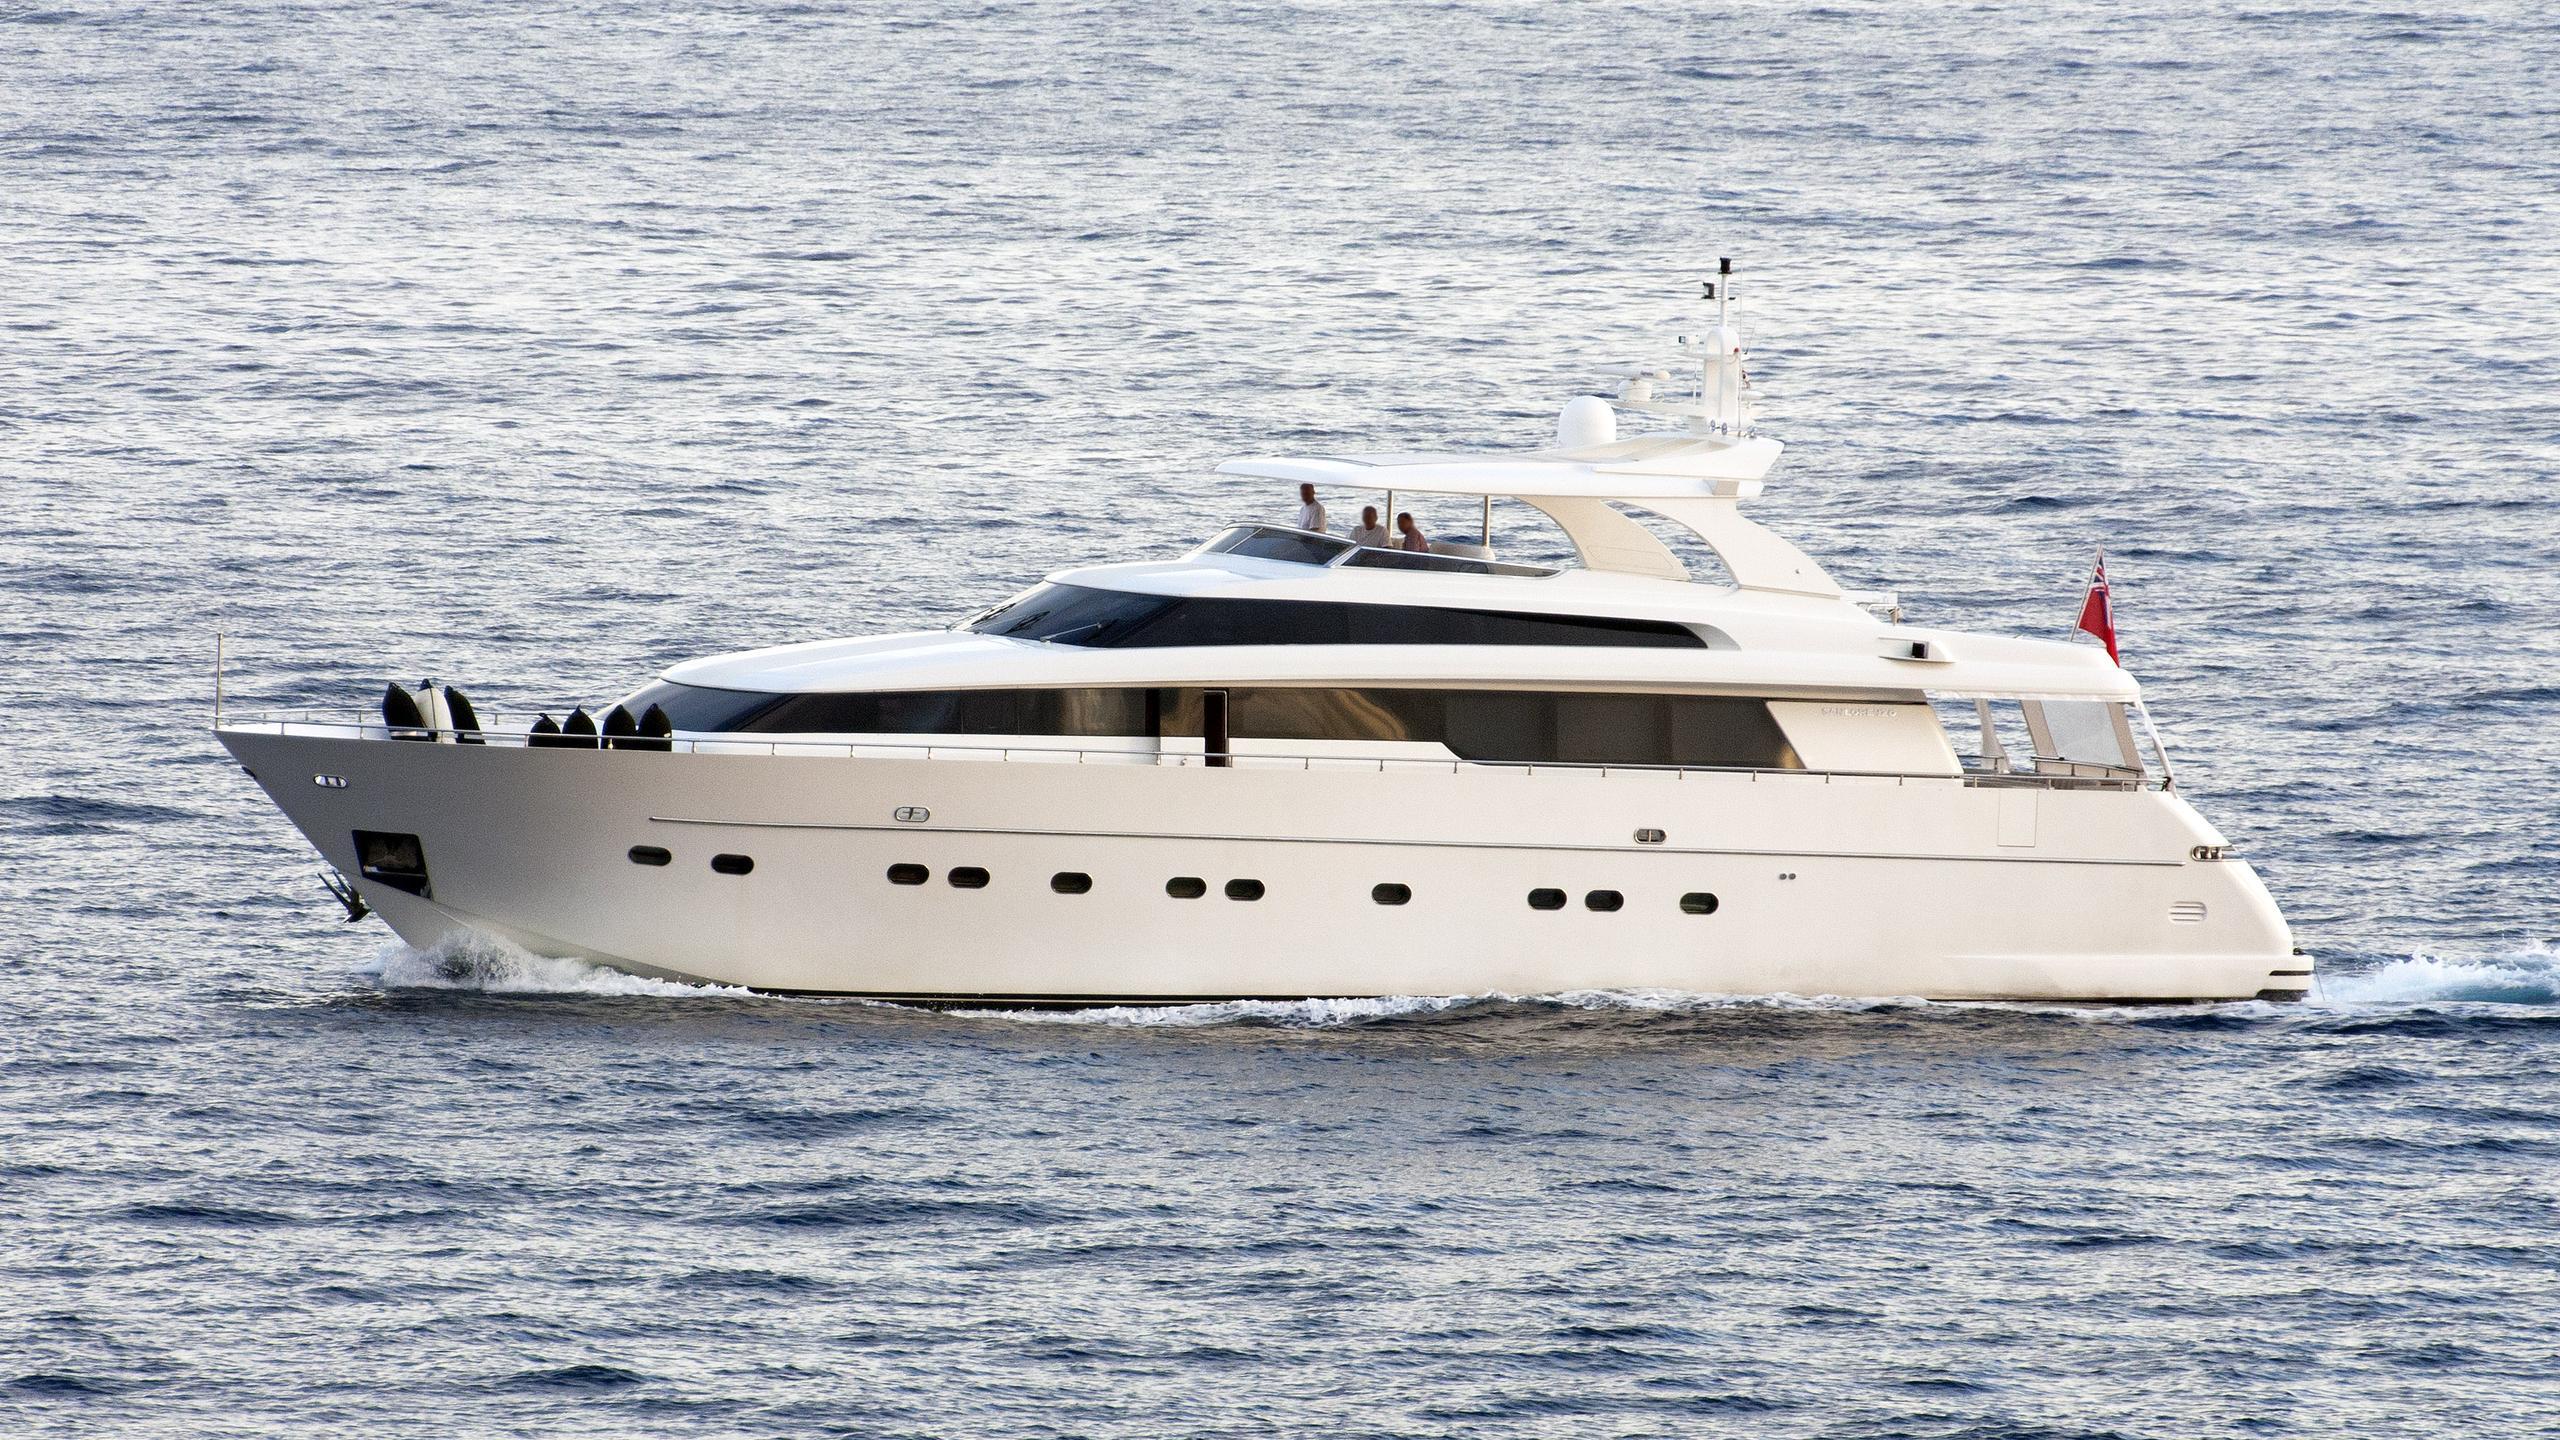 marcelina-of-london-motor-yacht-sanlorenzo-88-2007-27m-stern-profile